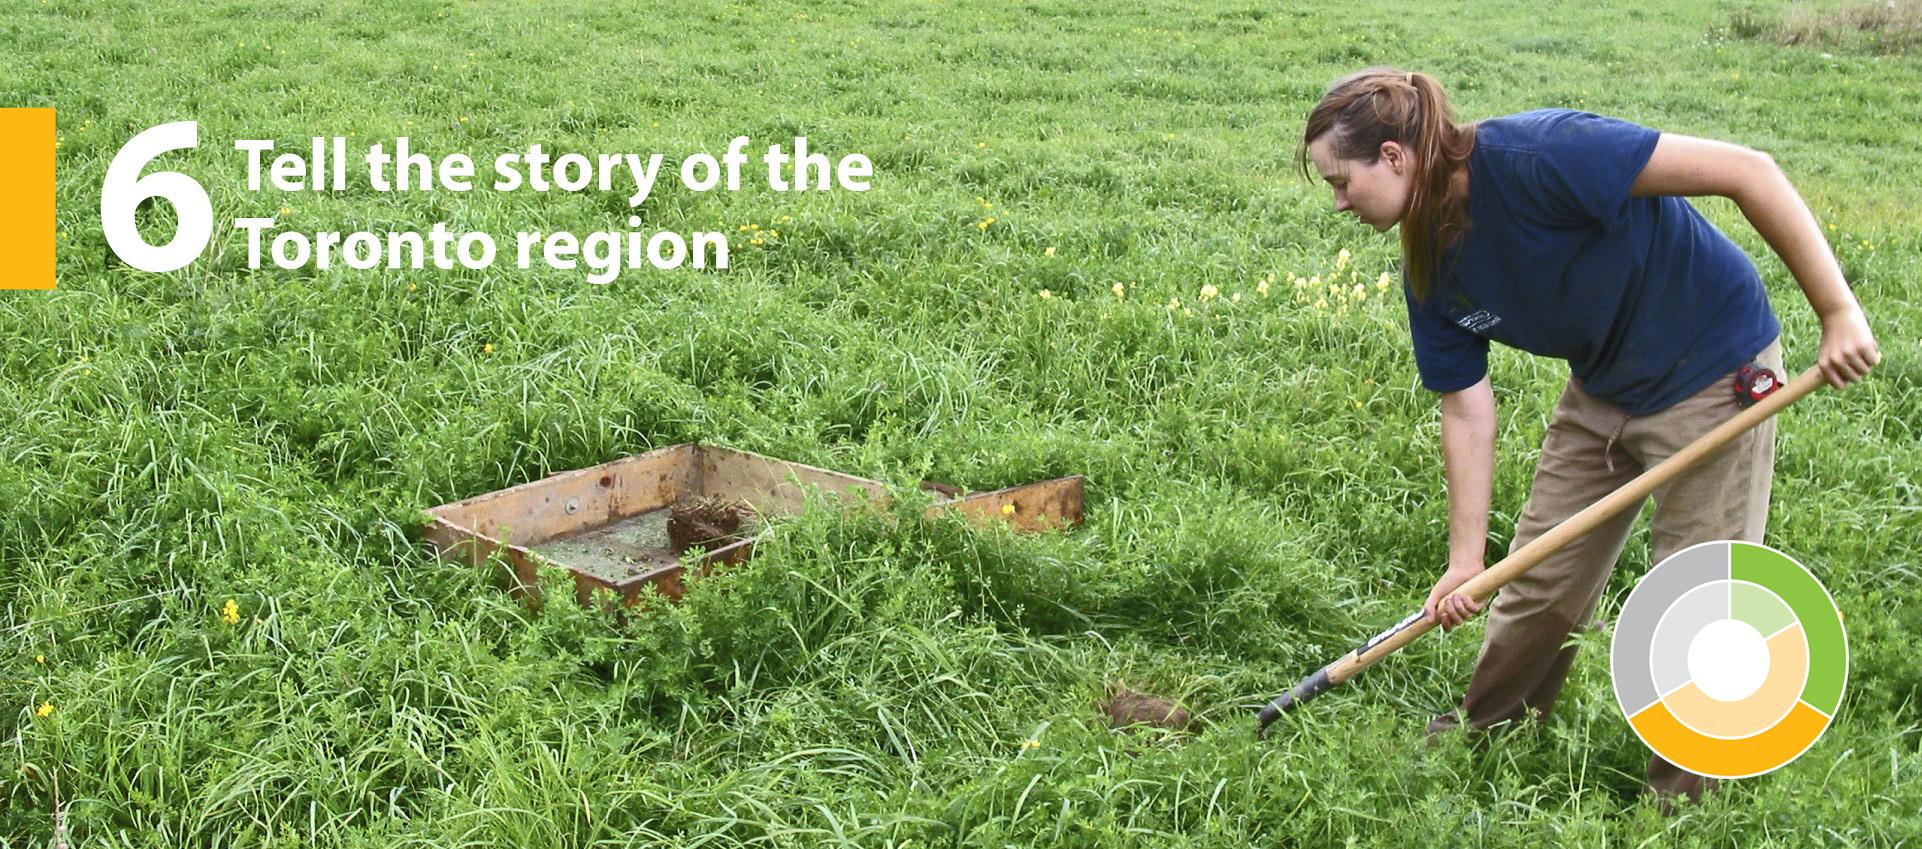 TRCA strategic goal 6 - Tell the story of the Toronto region